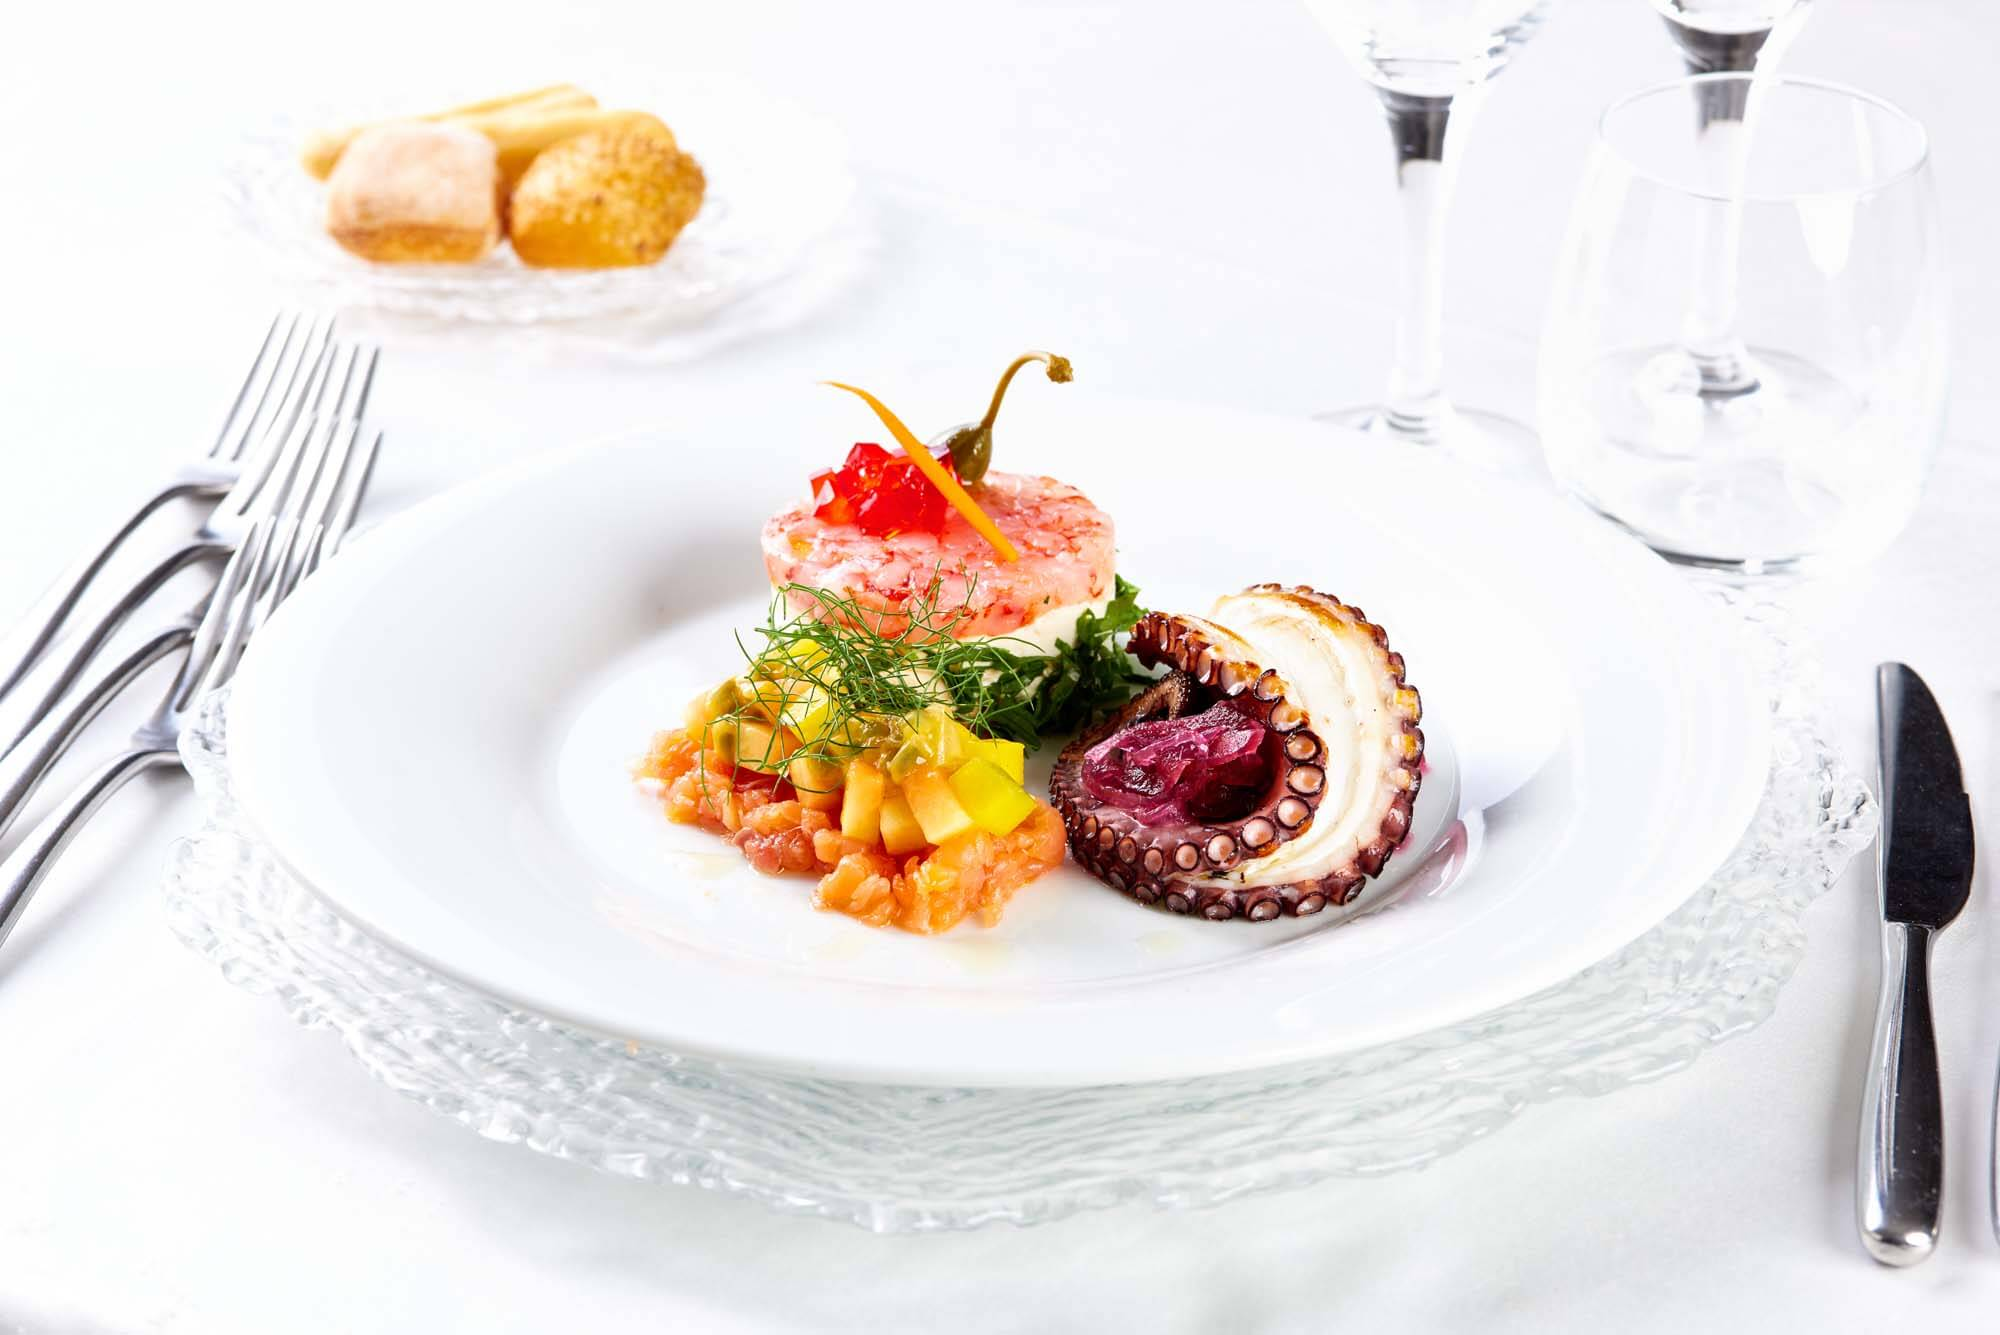 bbadv-photoshooting-food-villa-fabiana-06